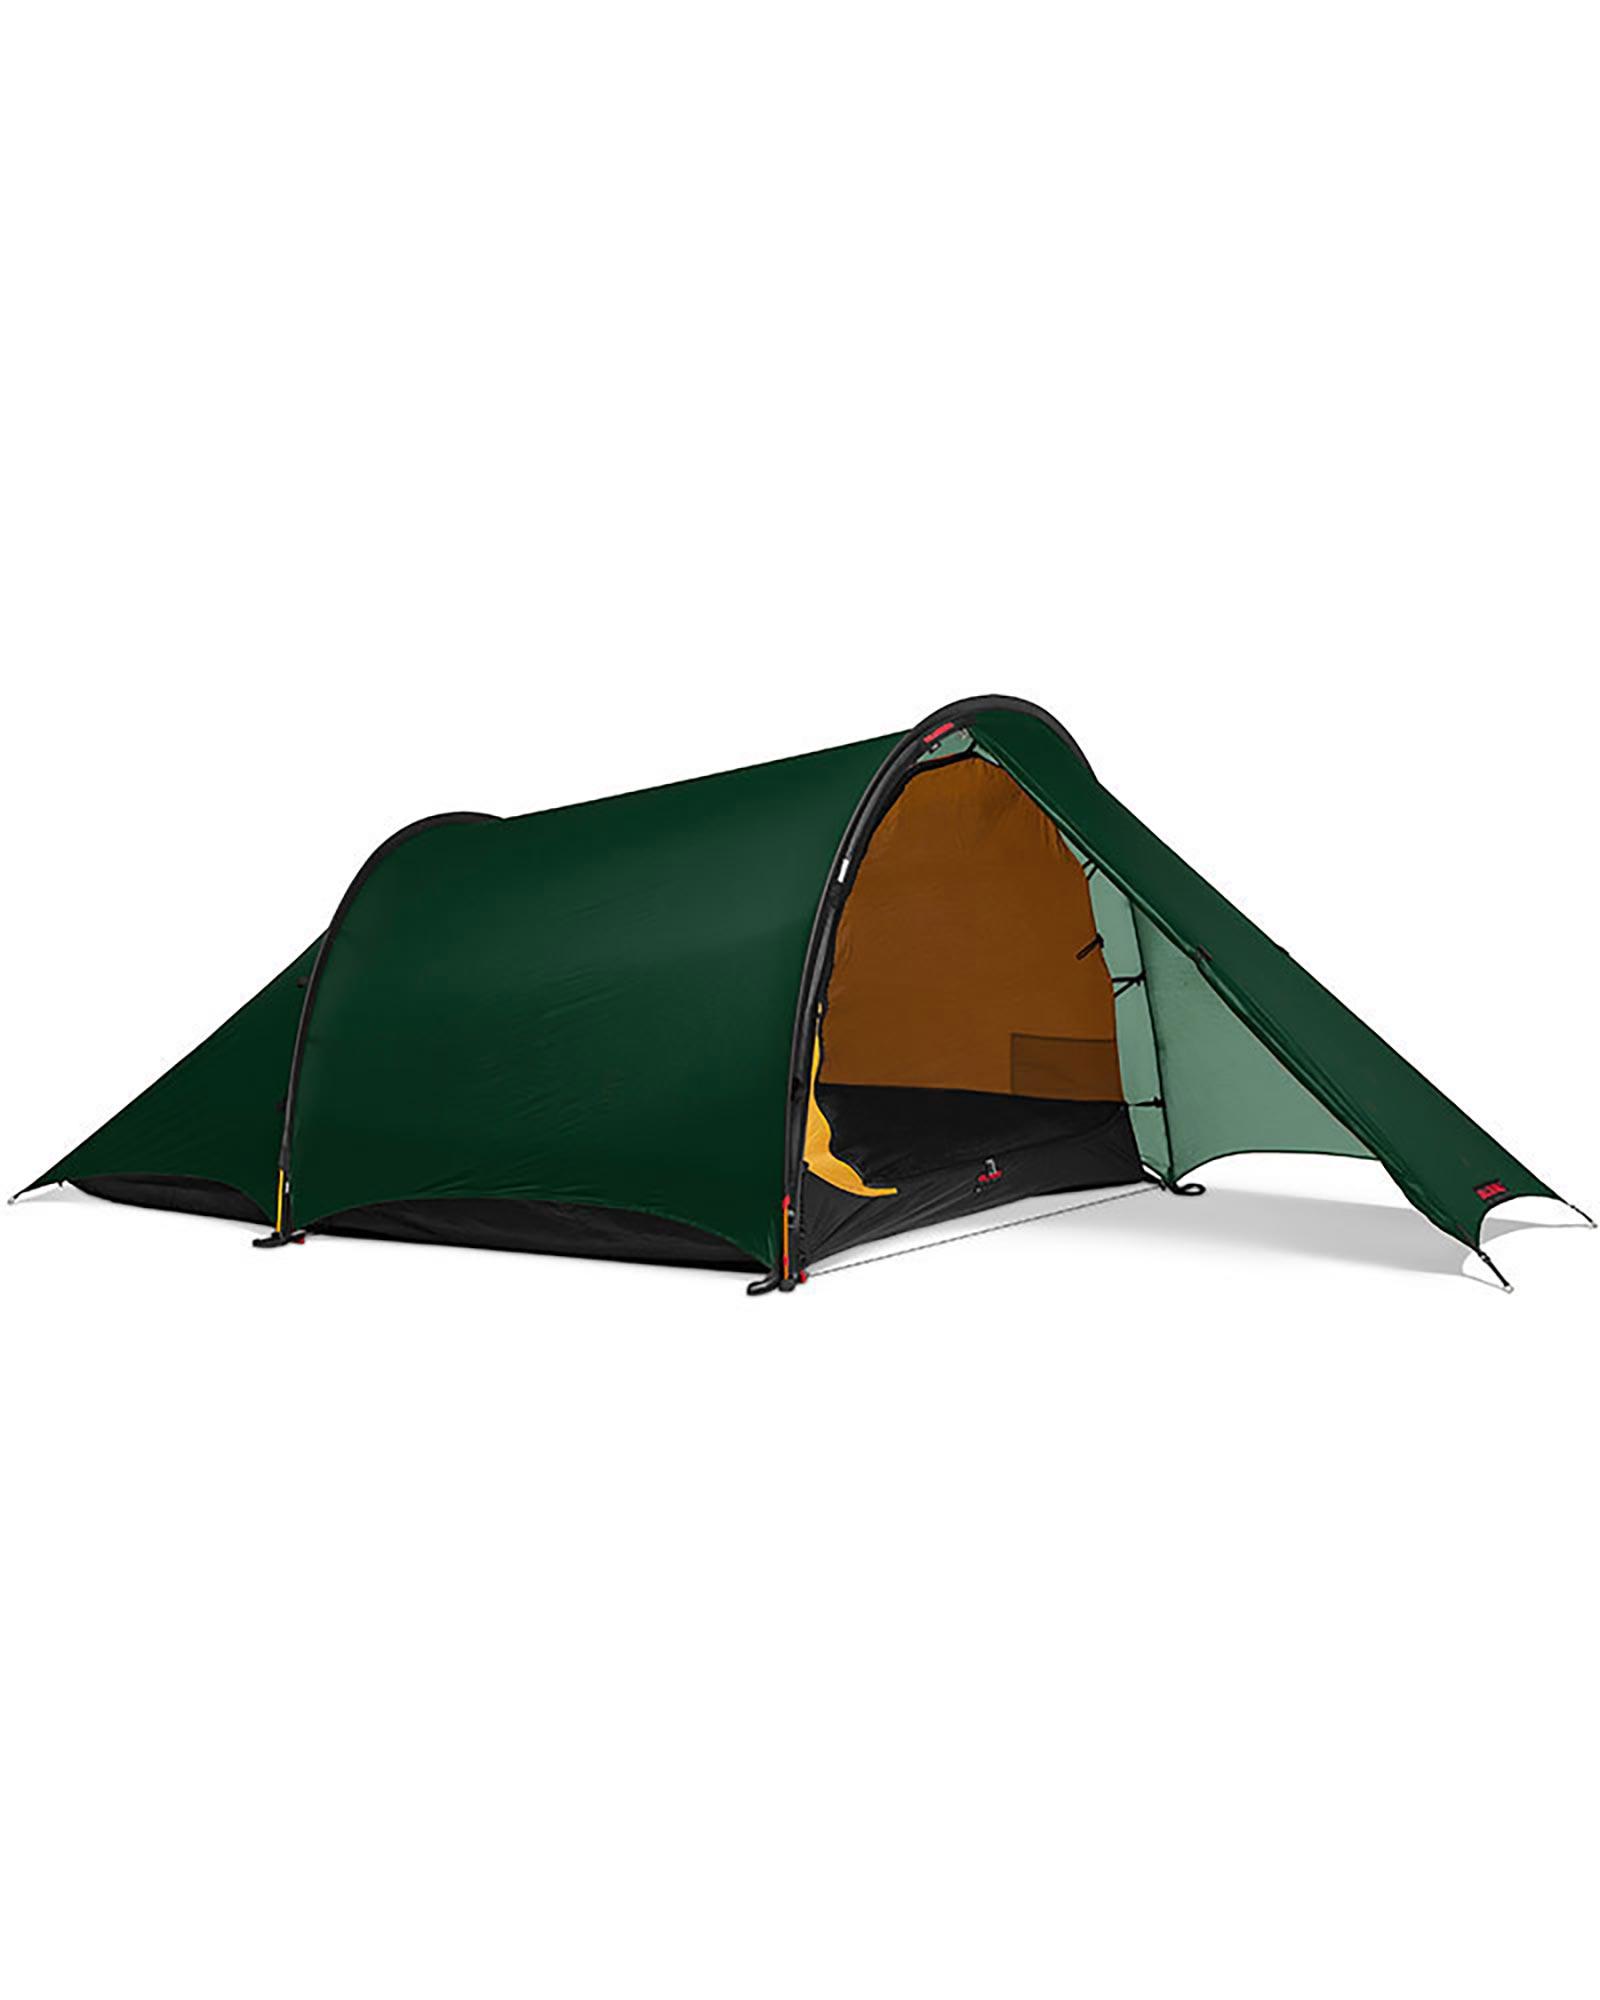 Hilleberg Anjan 2 Tent 0